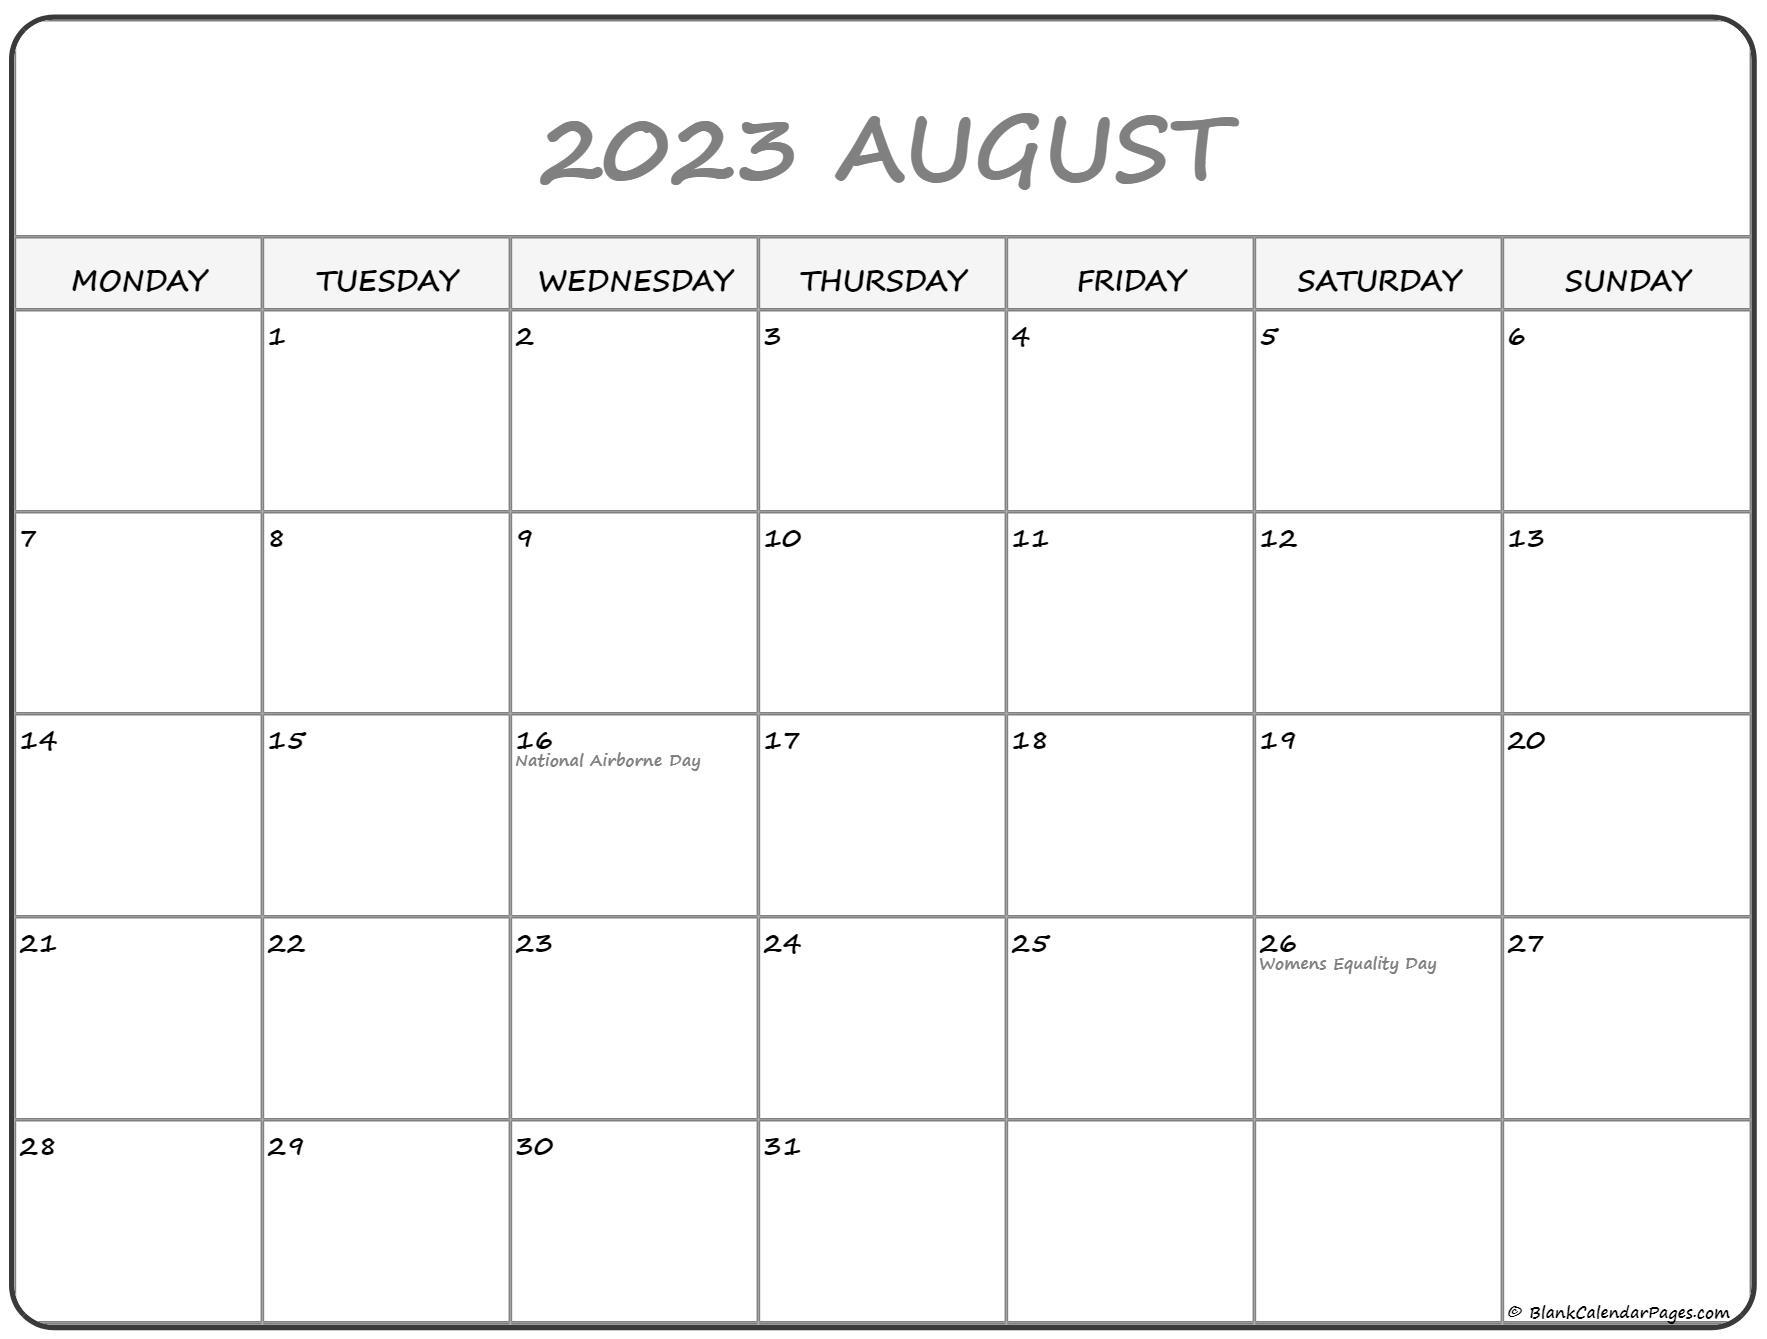 August 2022 Monday Calendar   Monday to Sunday